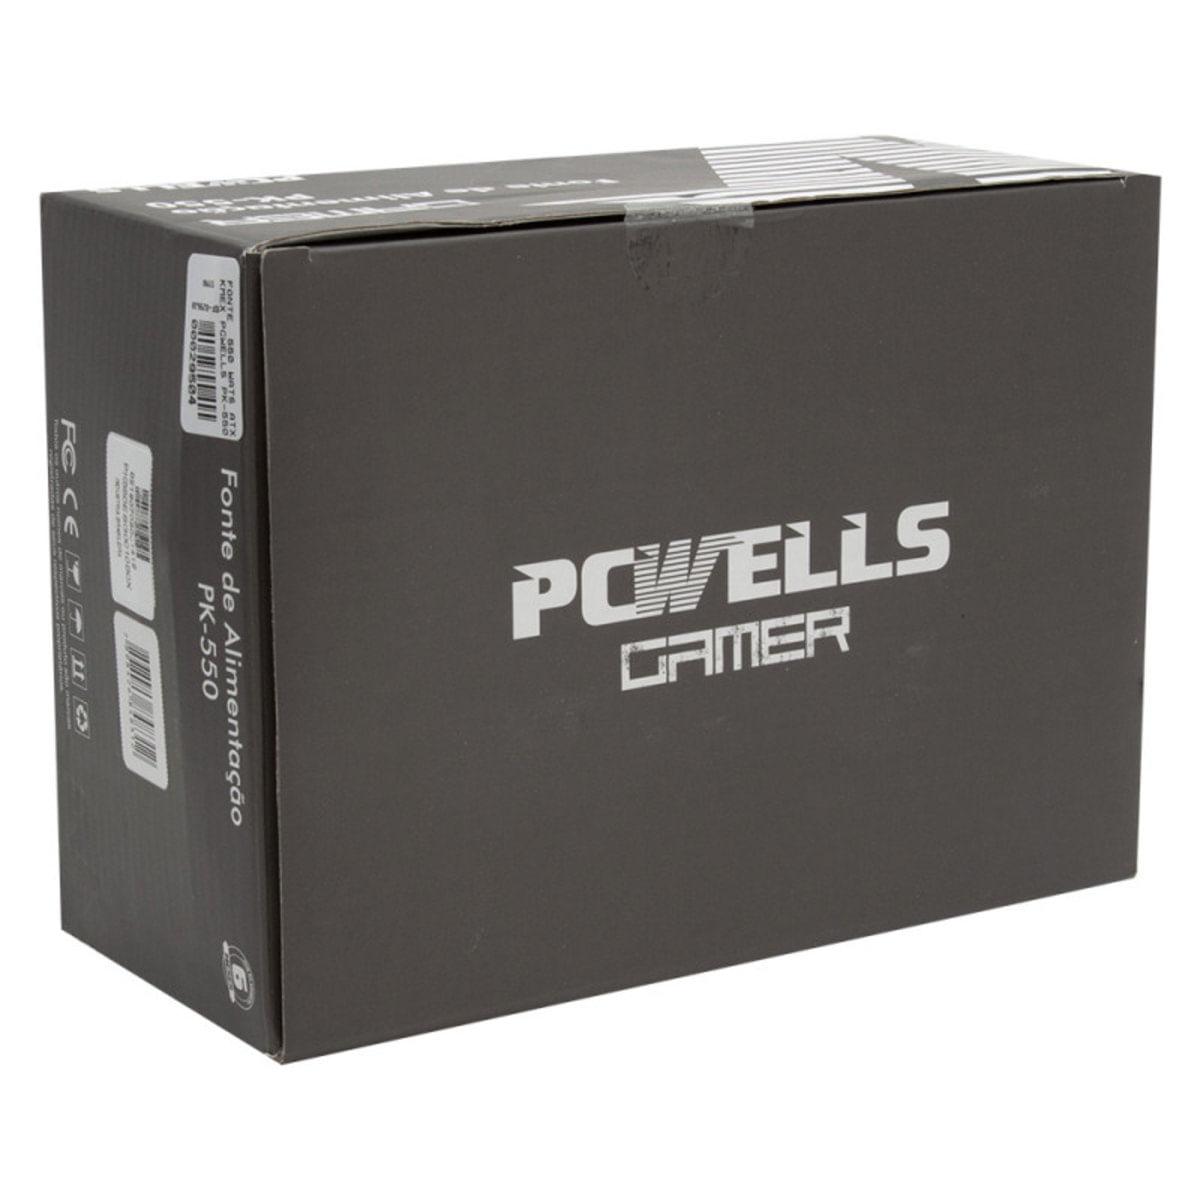 Fonte Atx 500W Reais Pk-550 Pcwells C/ Cabo Box